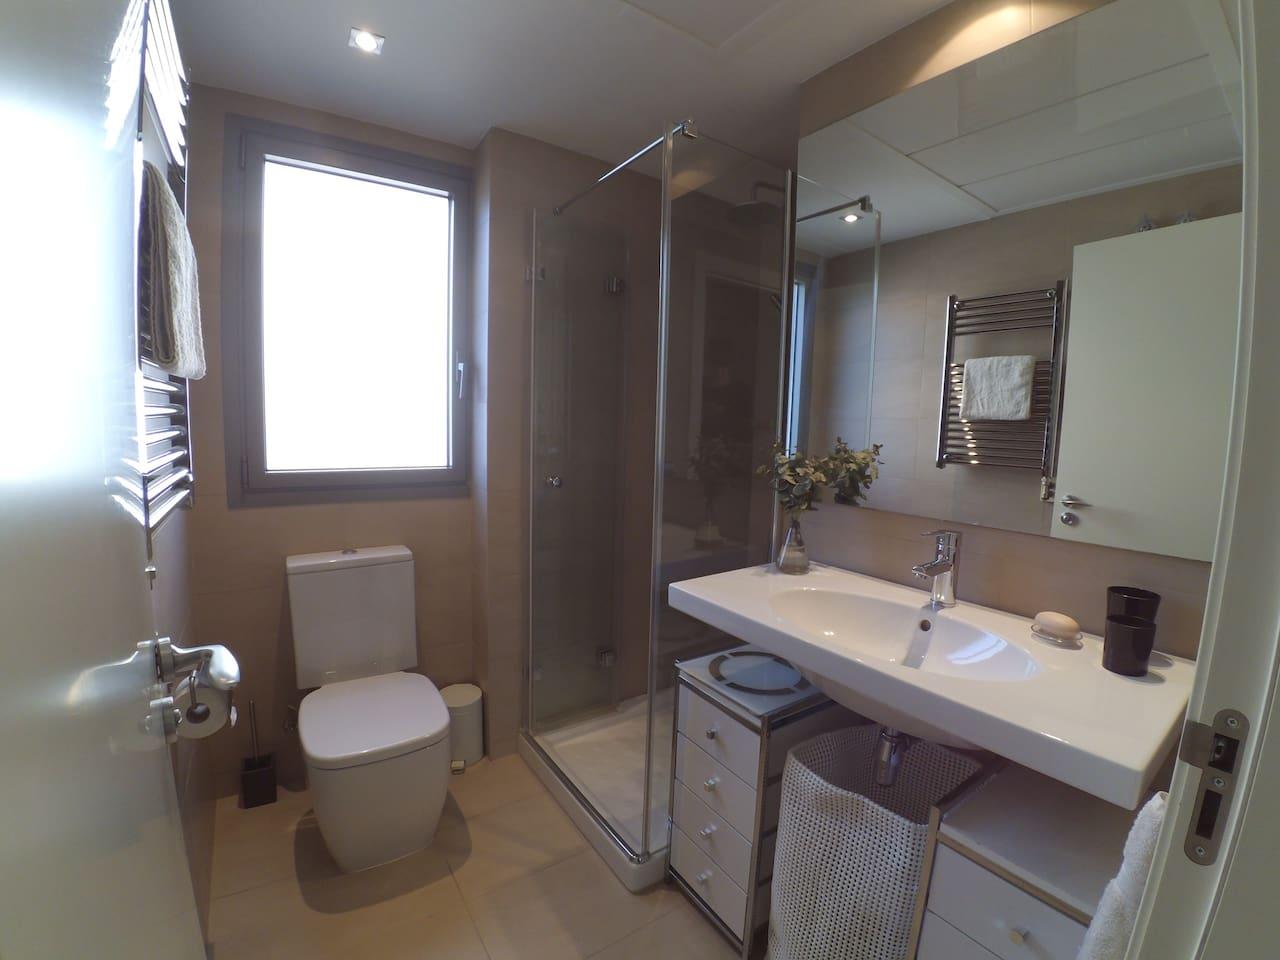 Private modern guest bathroom